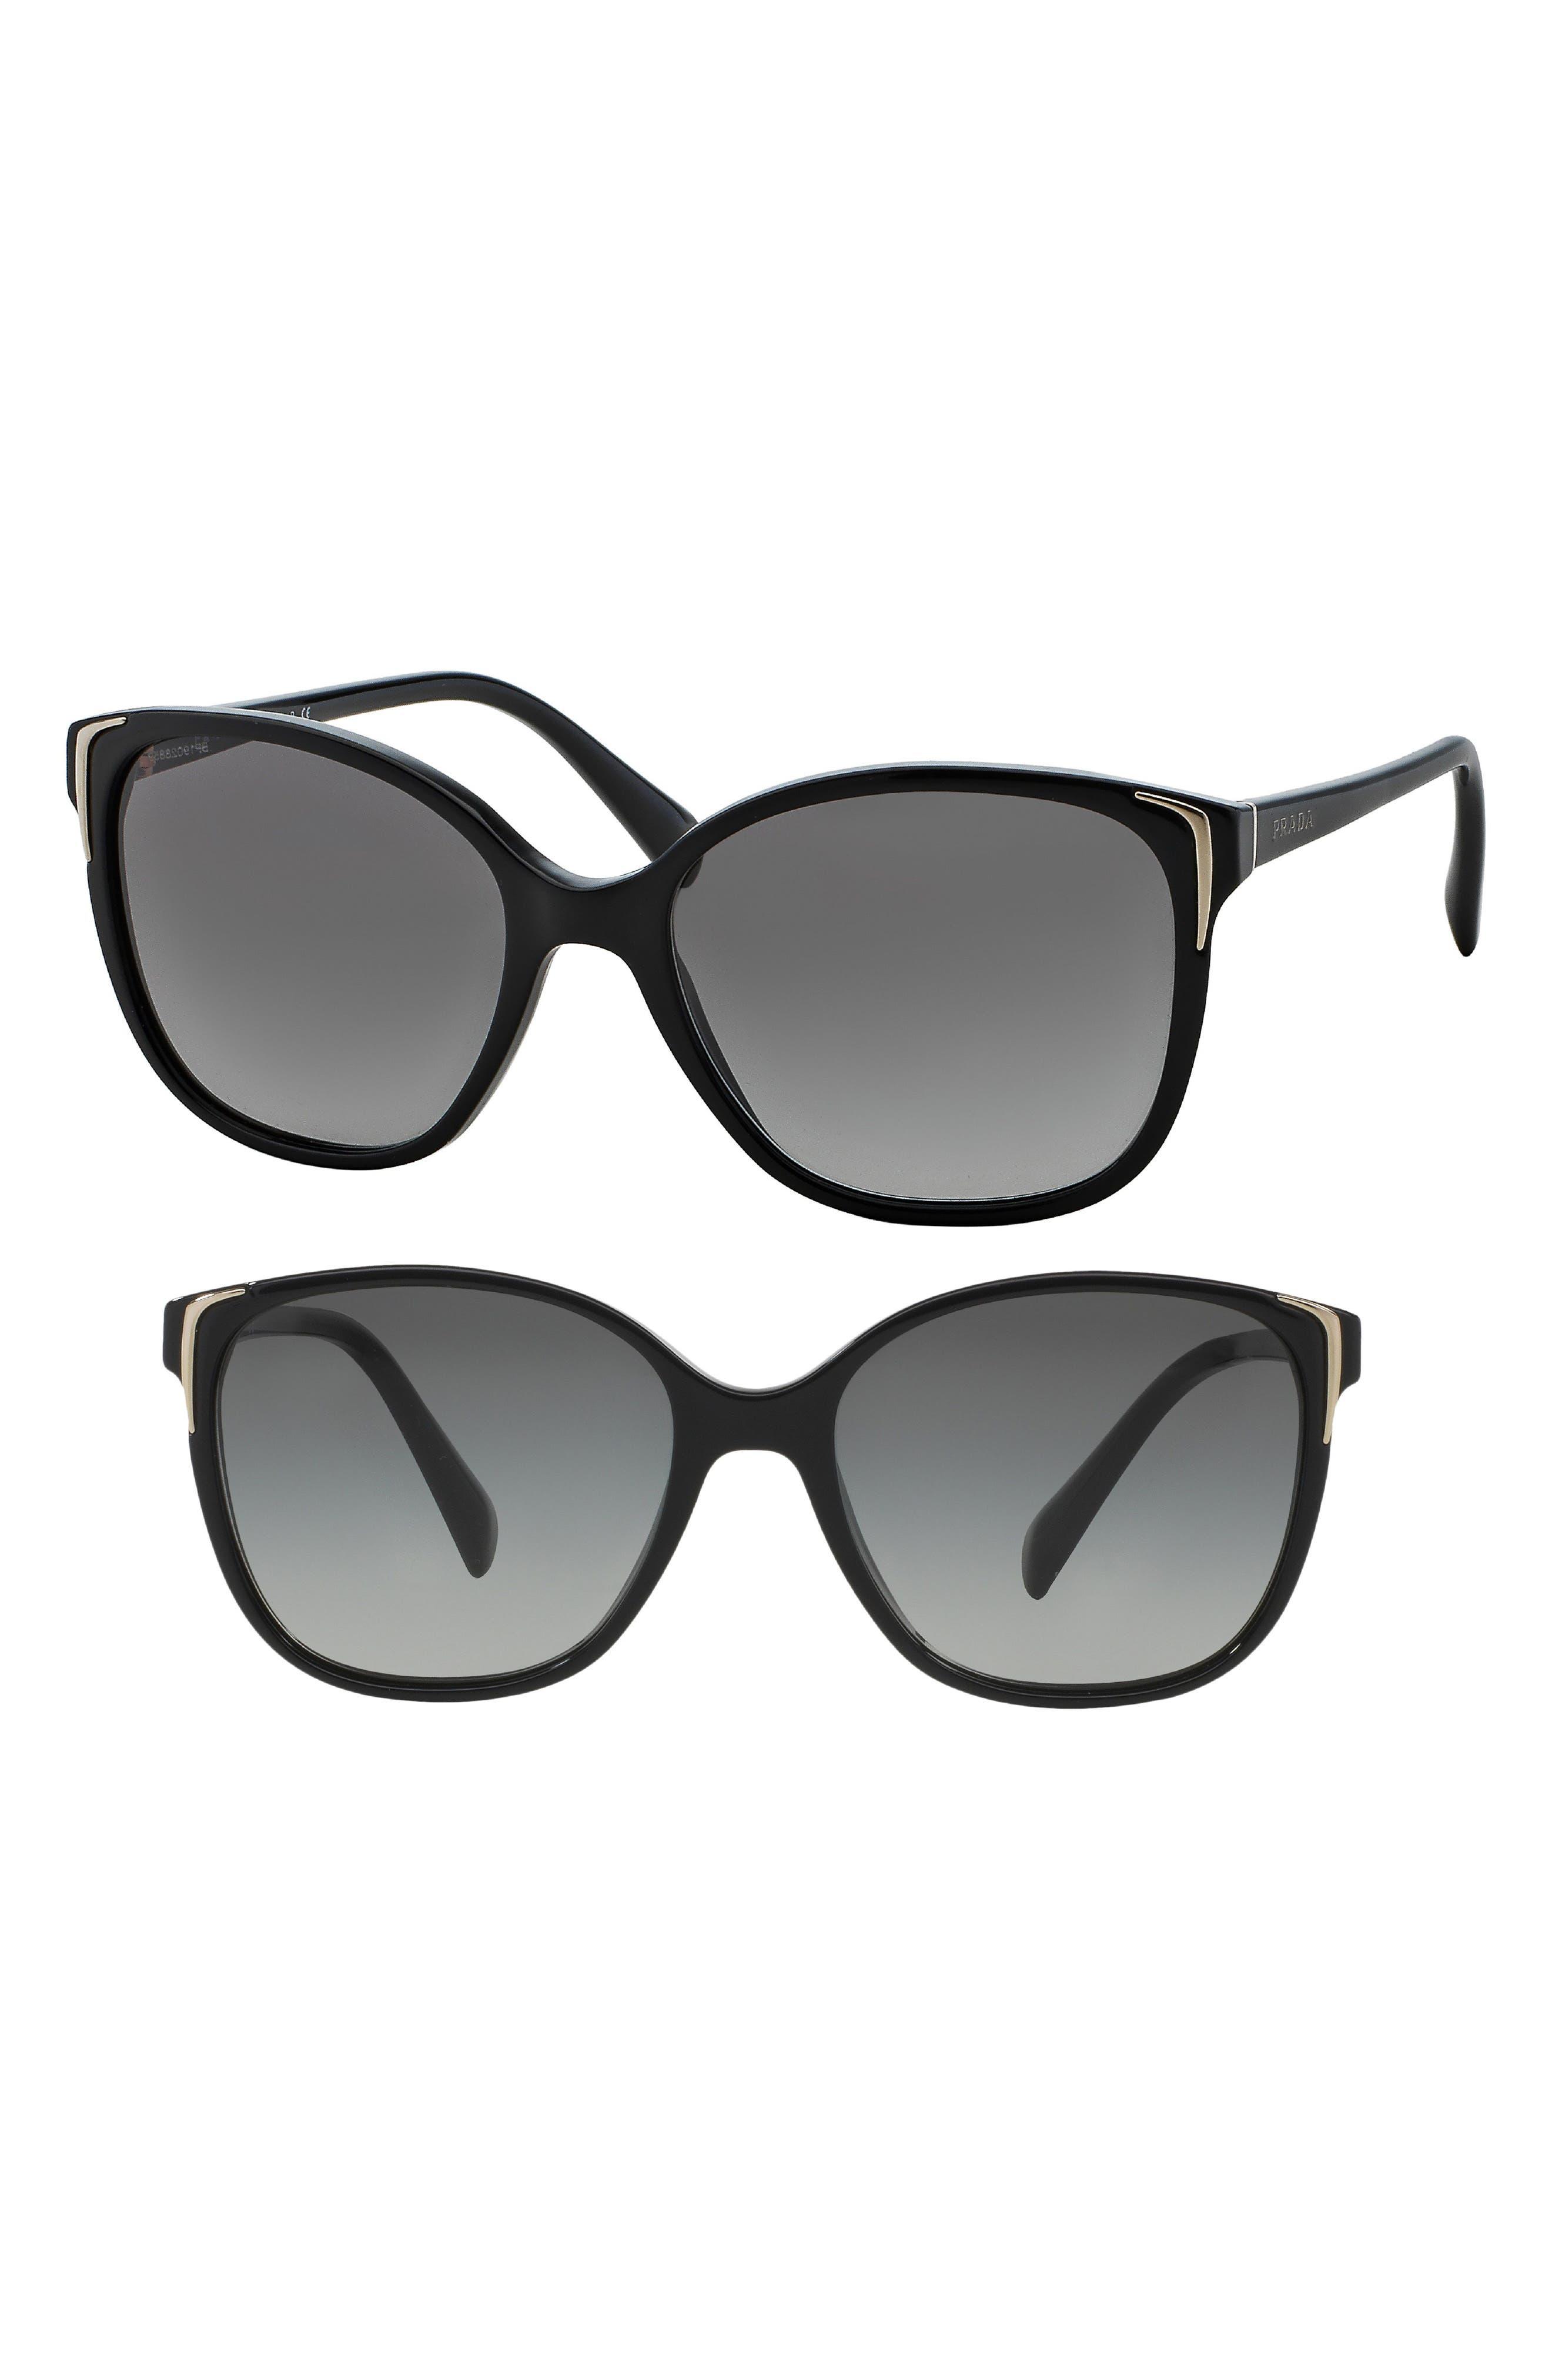 d841981bc677 Prada Women s Sunglasses   Eyewear